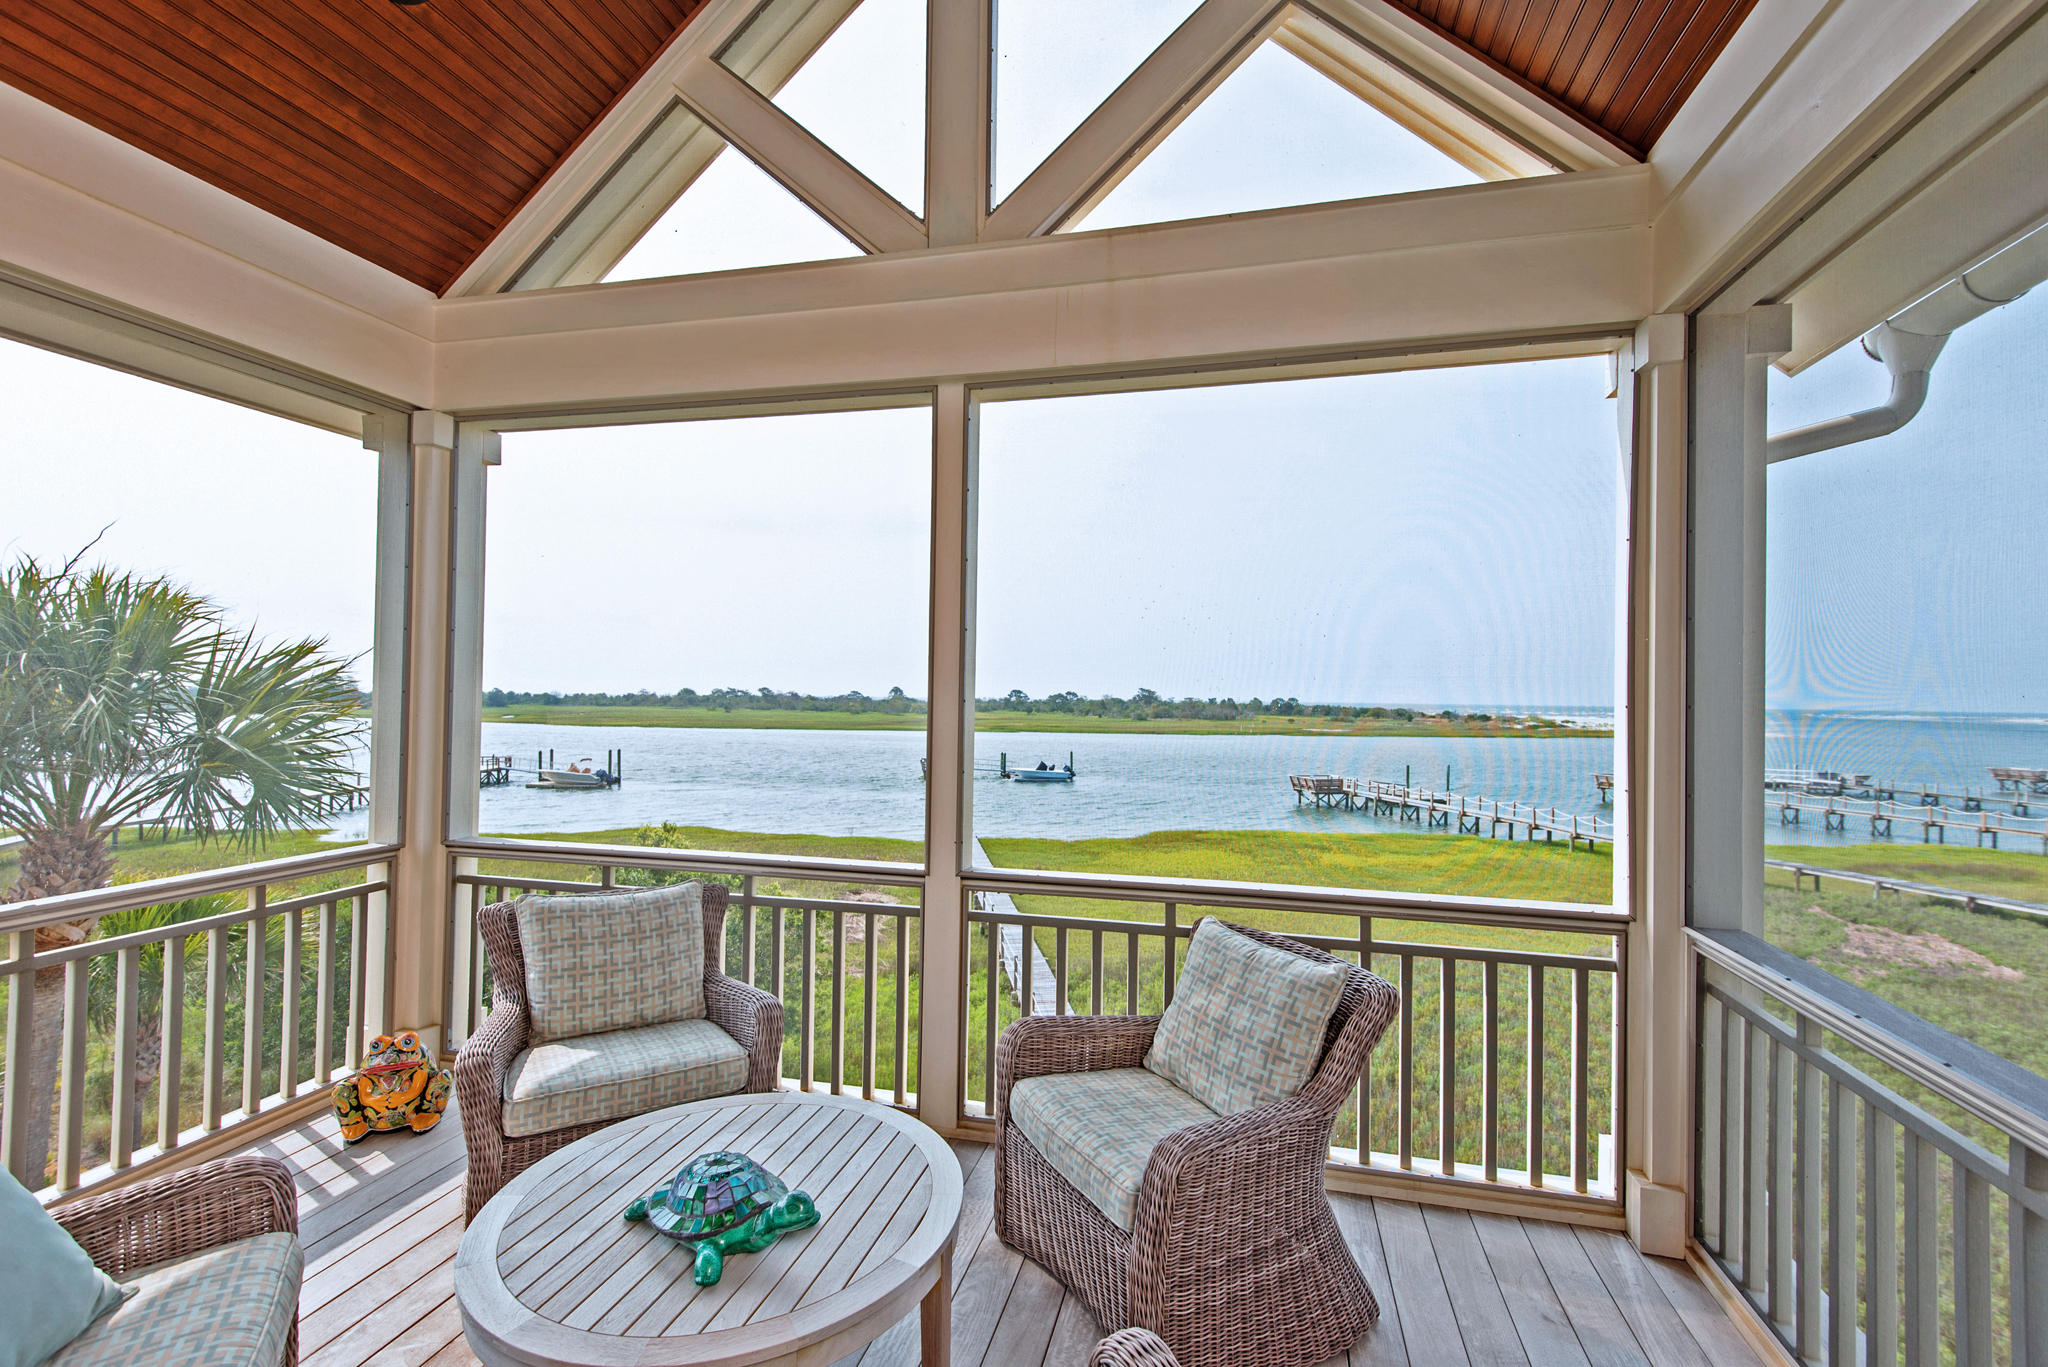 Seabrook Island Homes For Sale - 3135 Marshgate, Seabrook Island, SC - 46